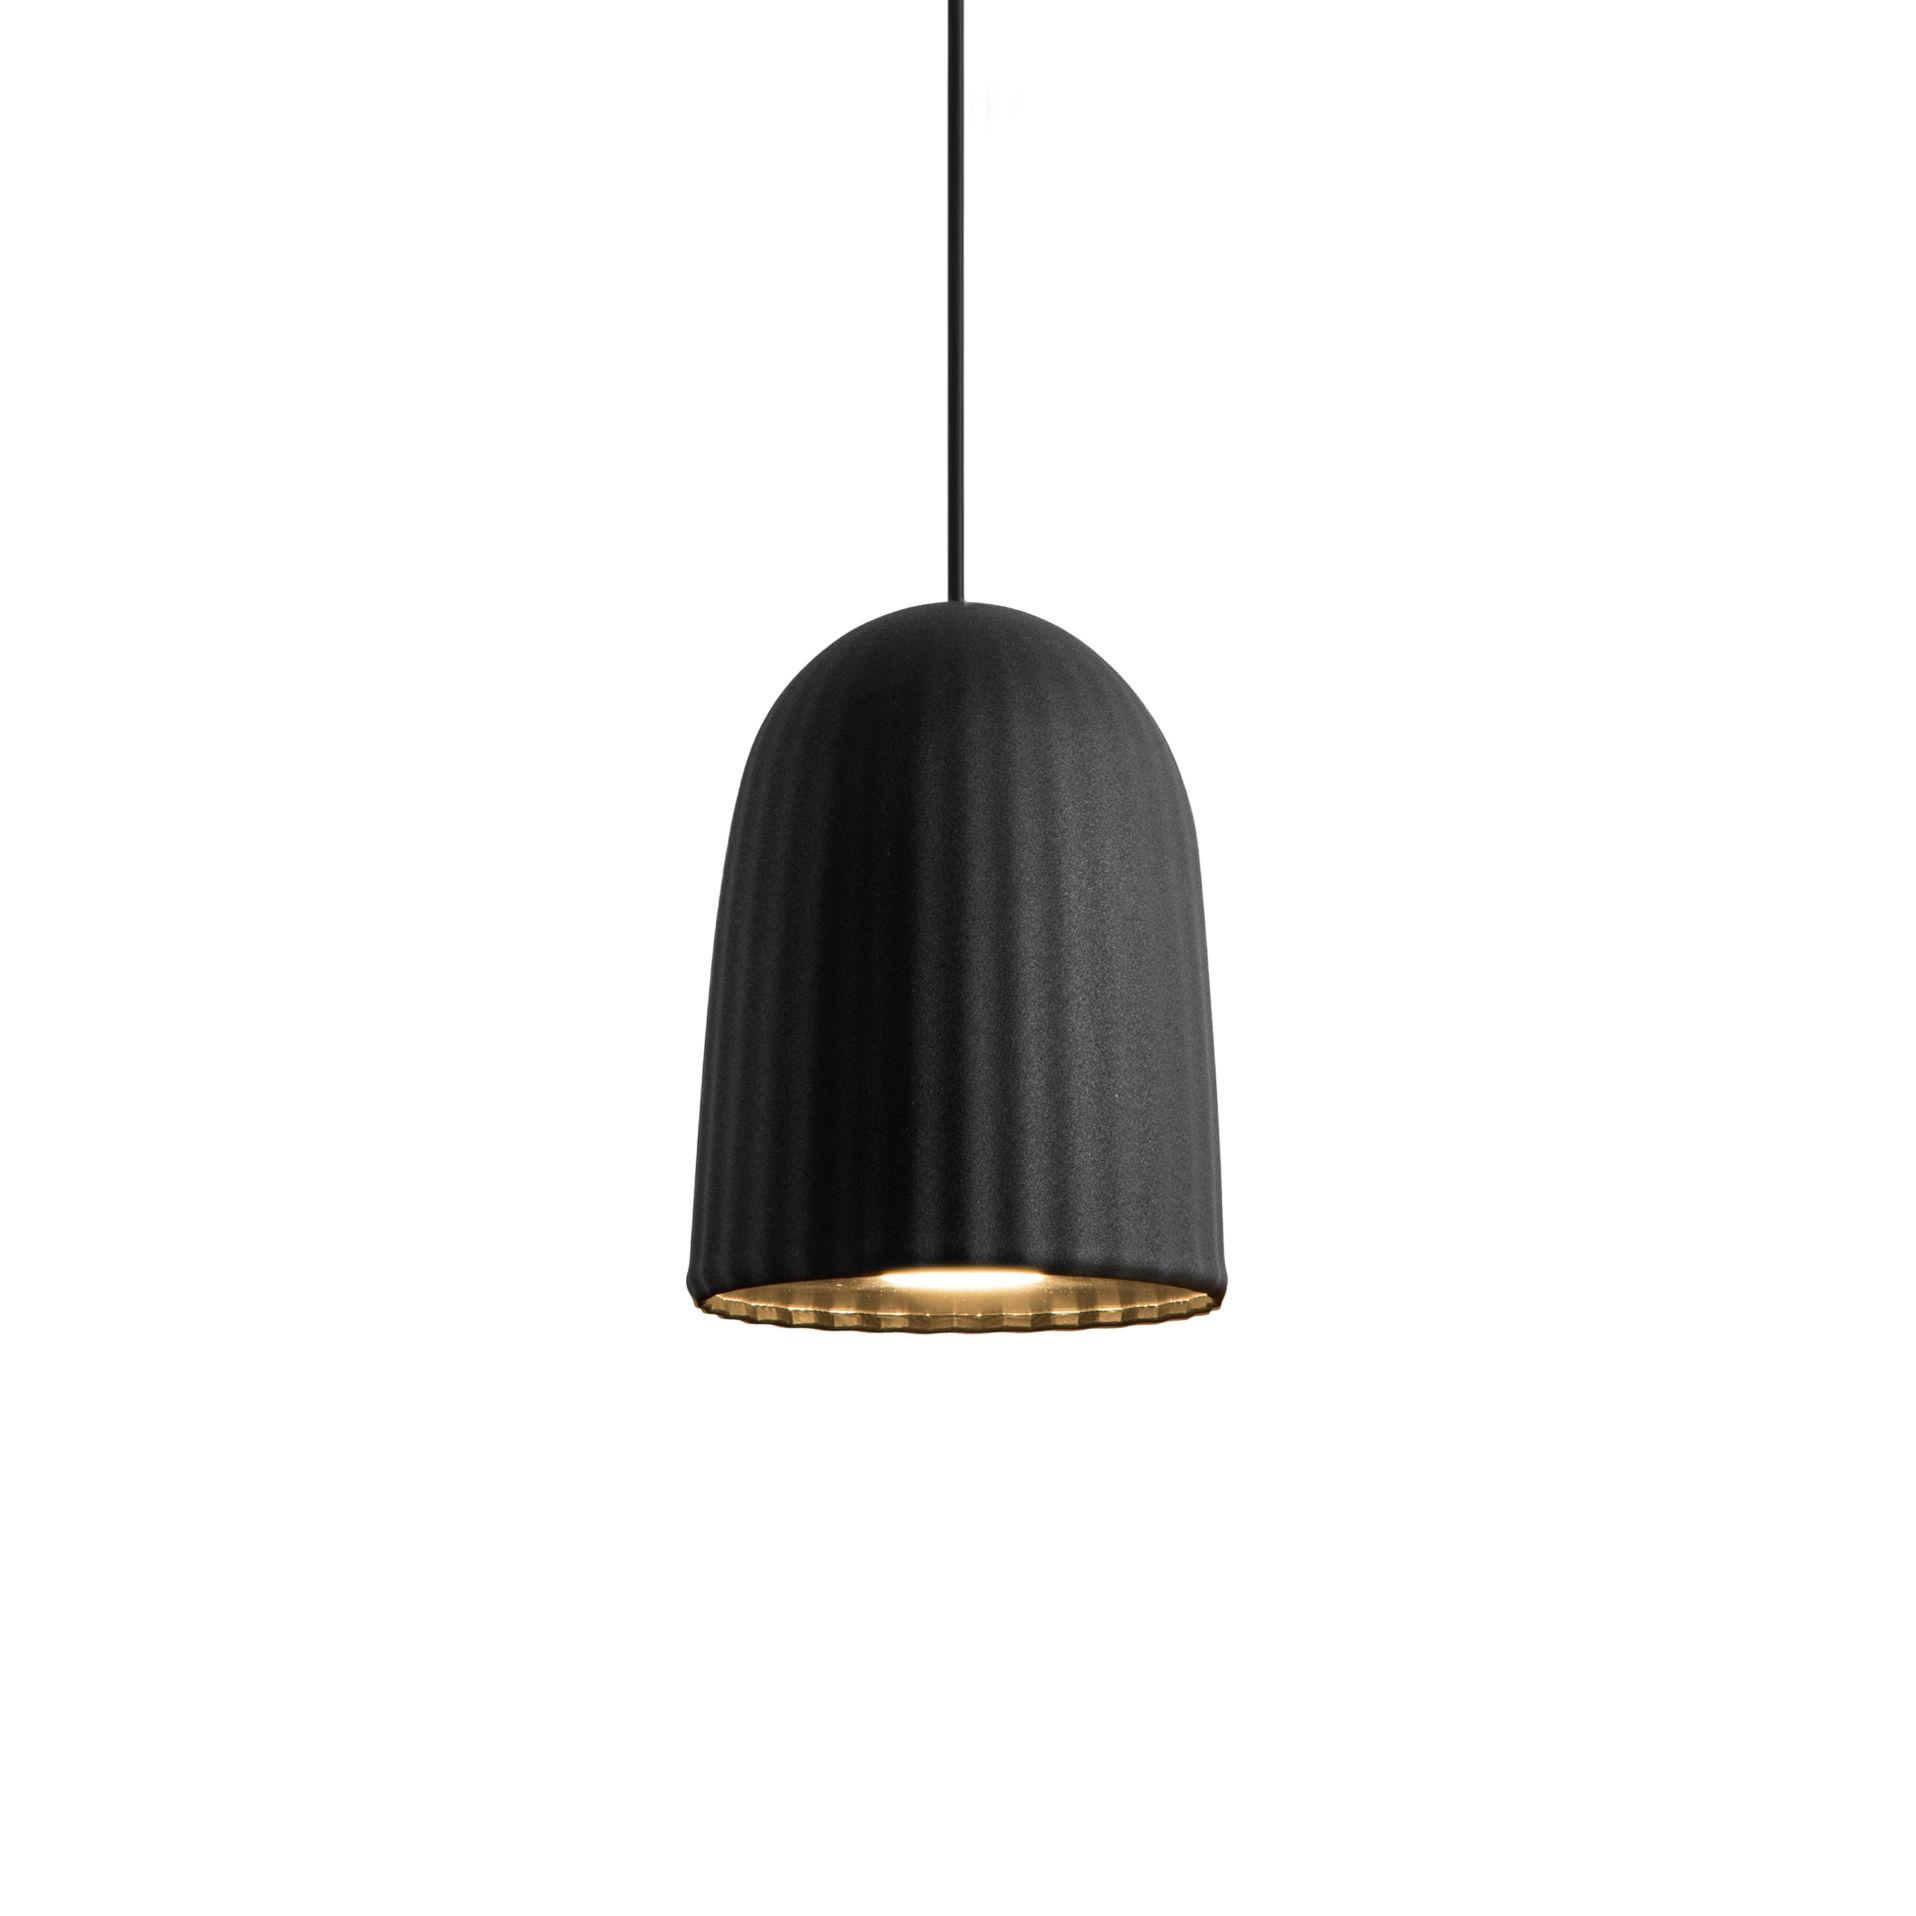 Luminaire - Suspensions - Suspension Chains Simple - Petite Friture - Noir - PVC